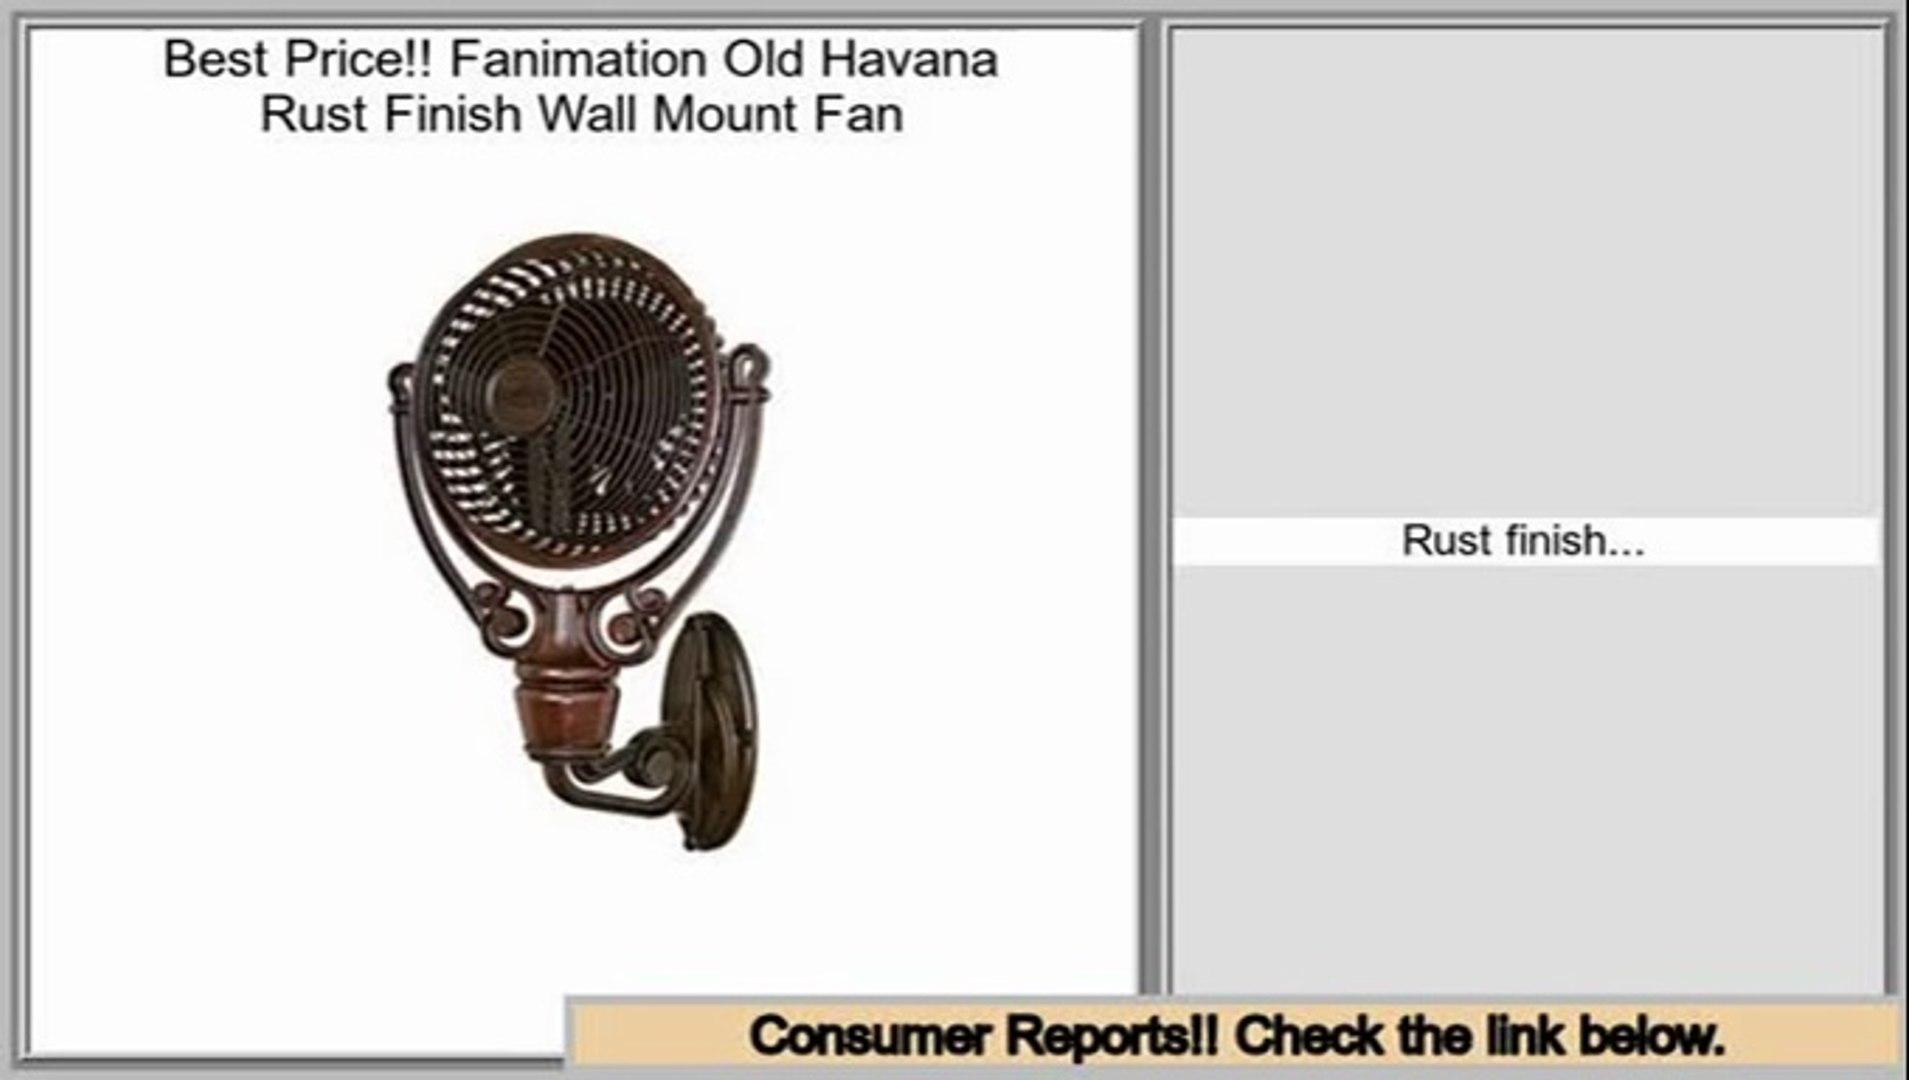 Consumer Reviews Fanimation Old Havana Rust Finish Wall Mount Fan